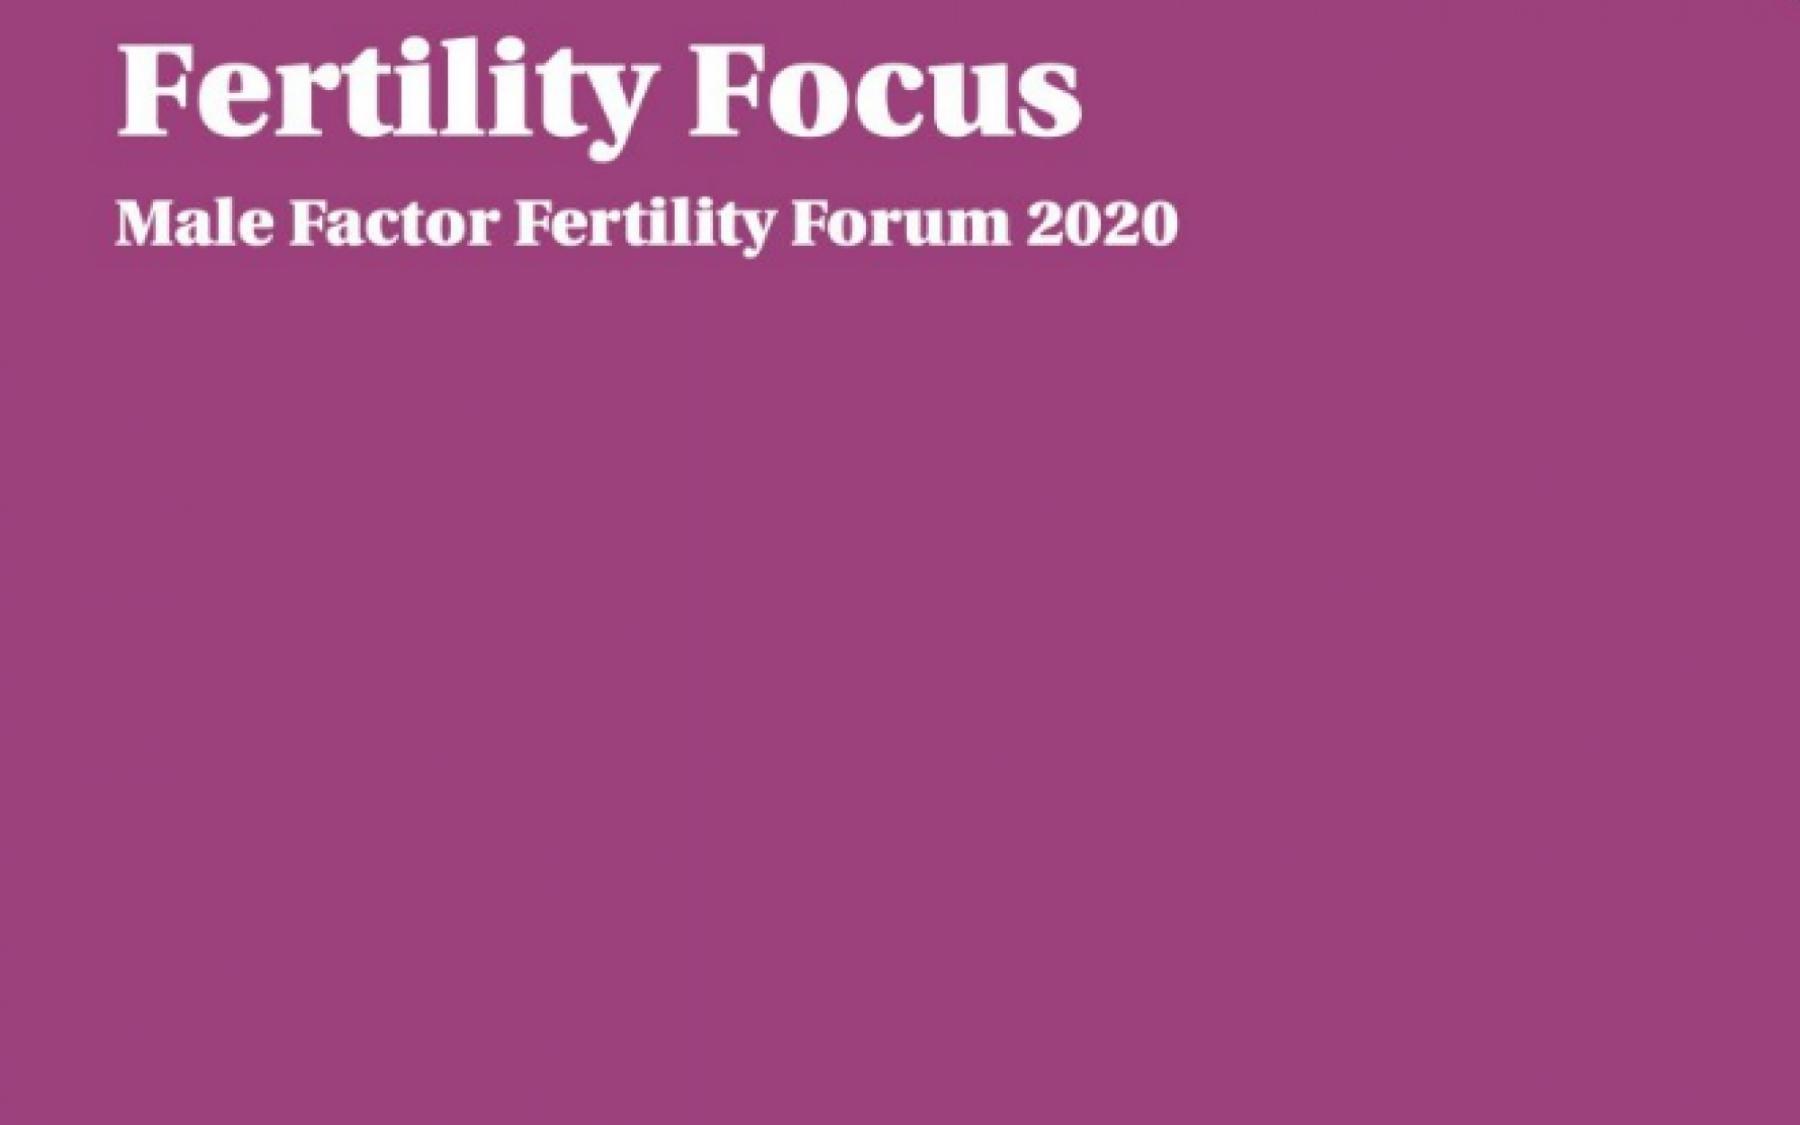 Fertility Focus - an important read